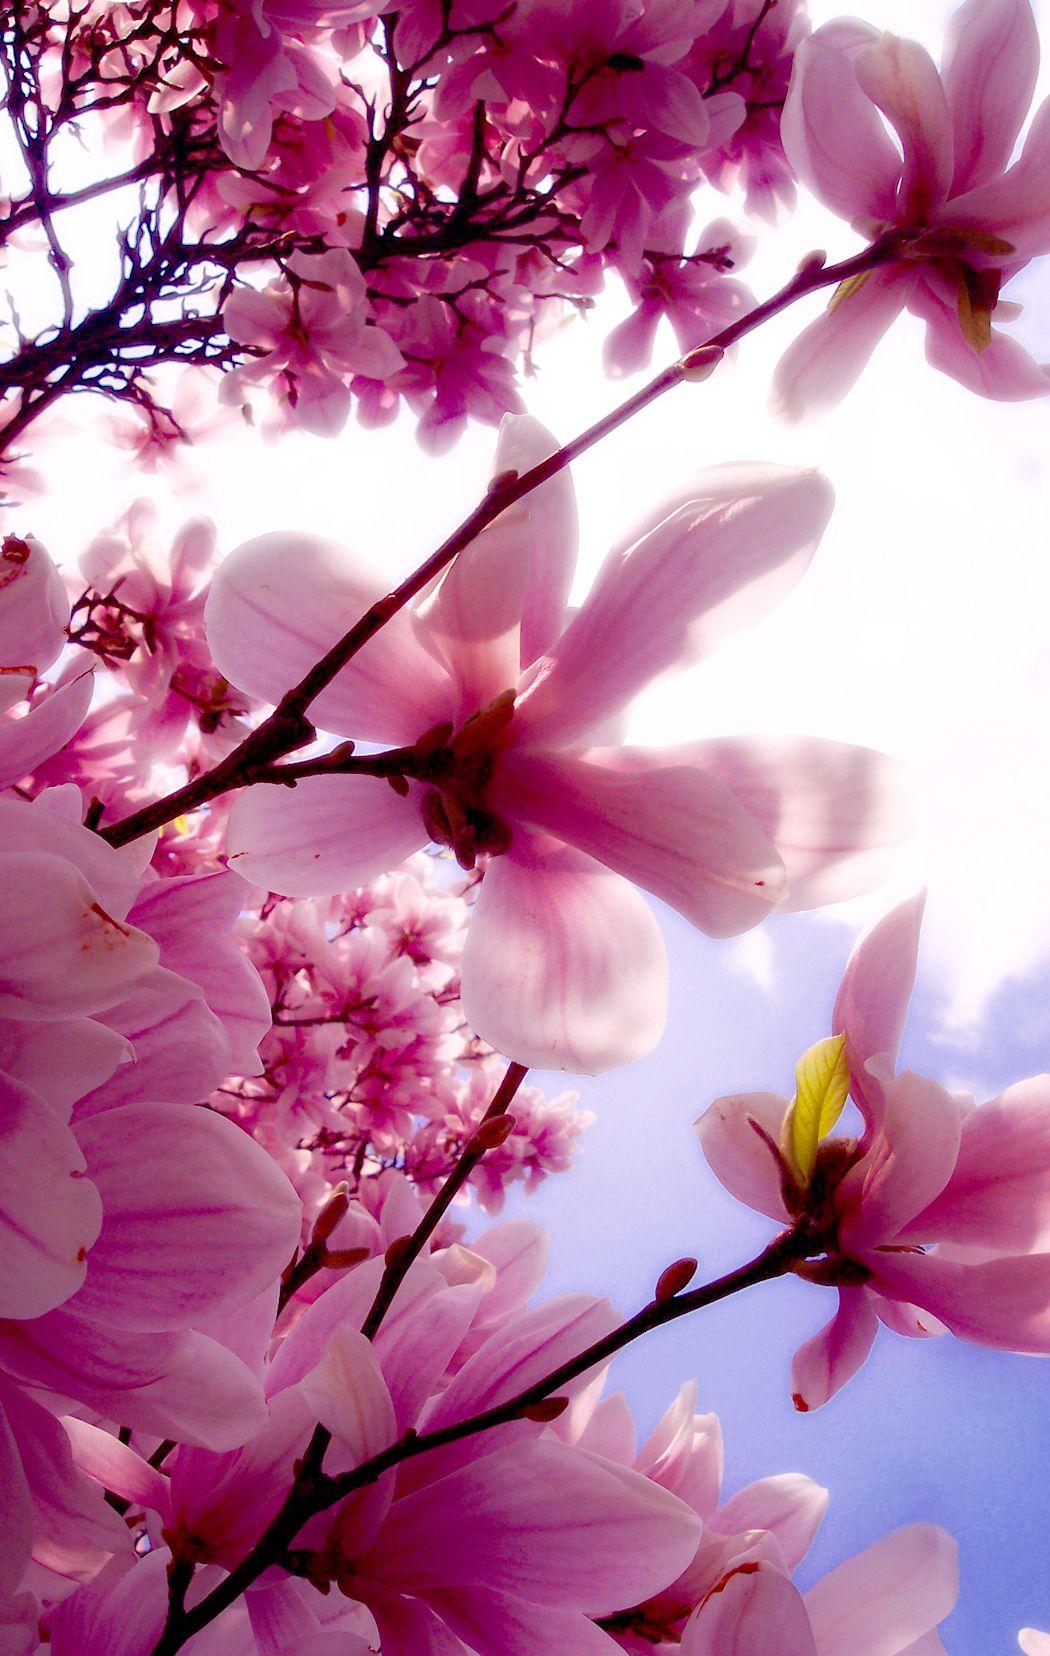 Magnolias Blüten Traum Pinterest Magnolia Flowers and Flower